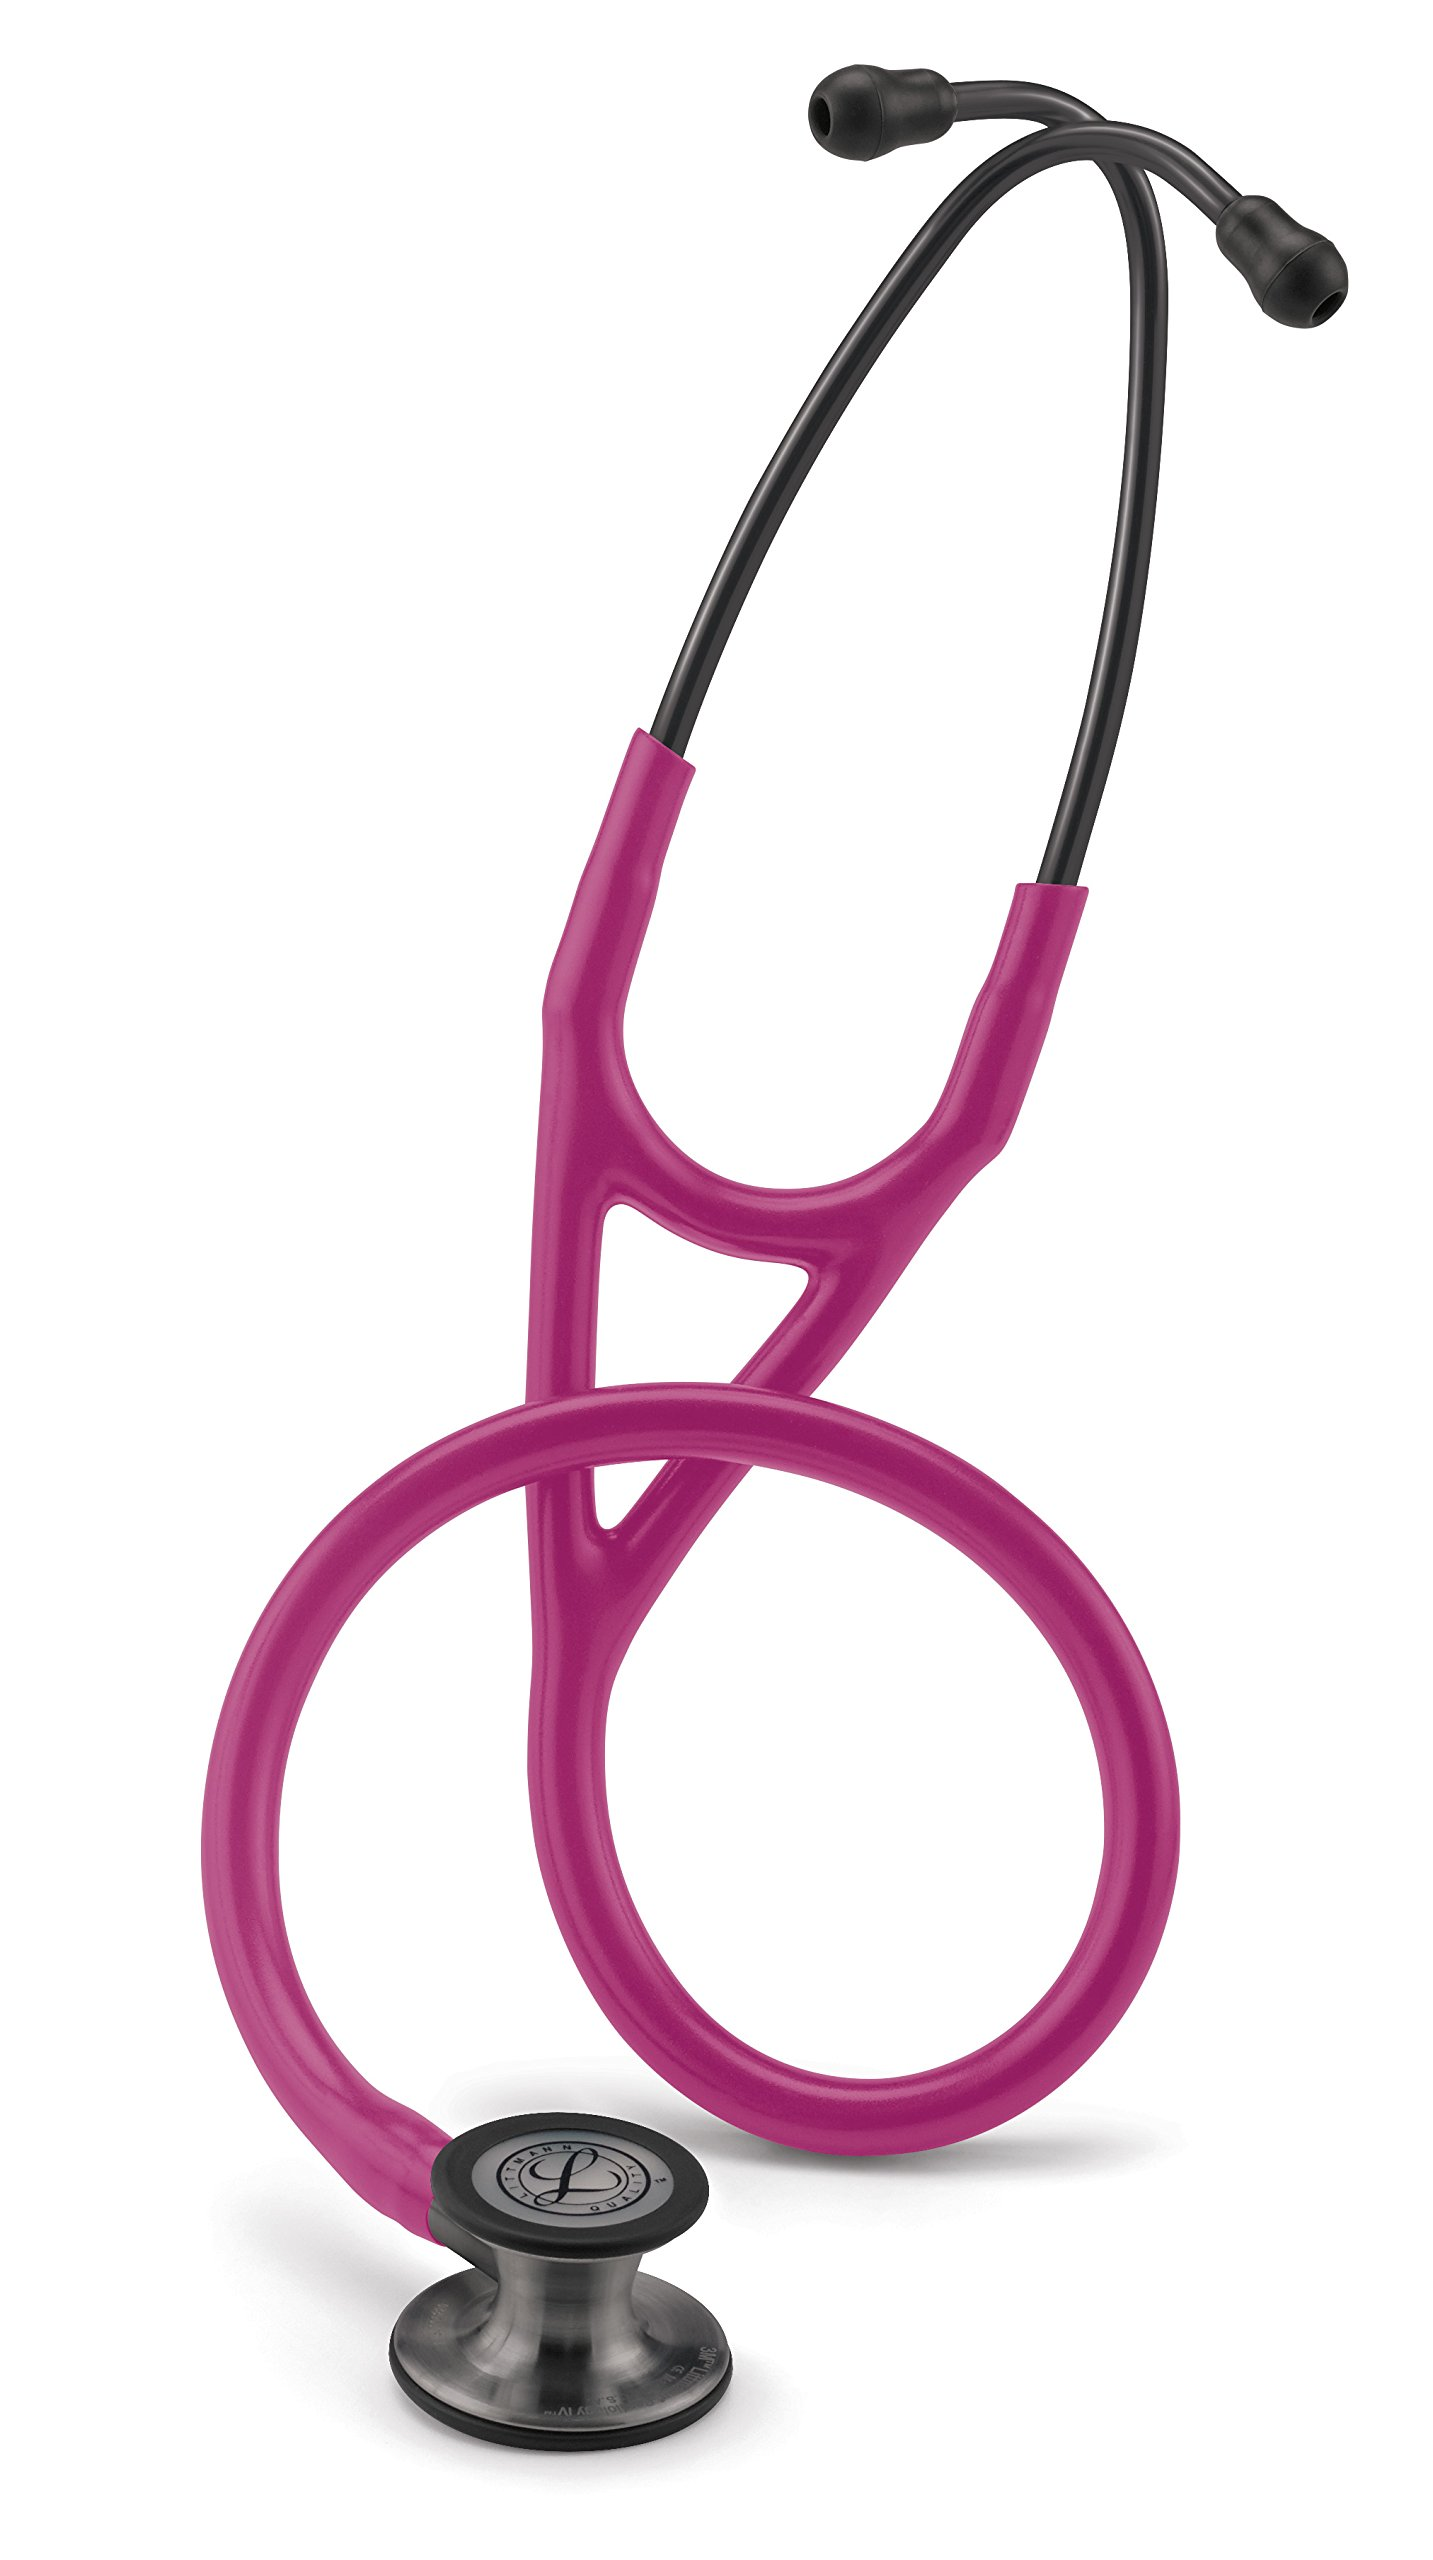 3M Health Care 6178 Littmann Cardiology IV Stethoscope, Raspberry